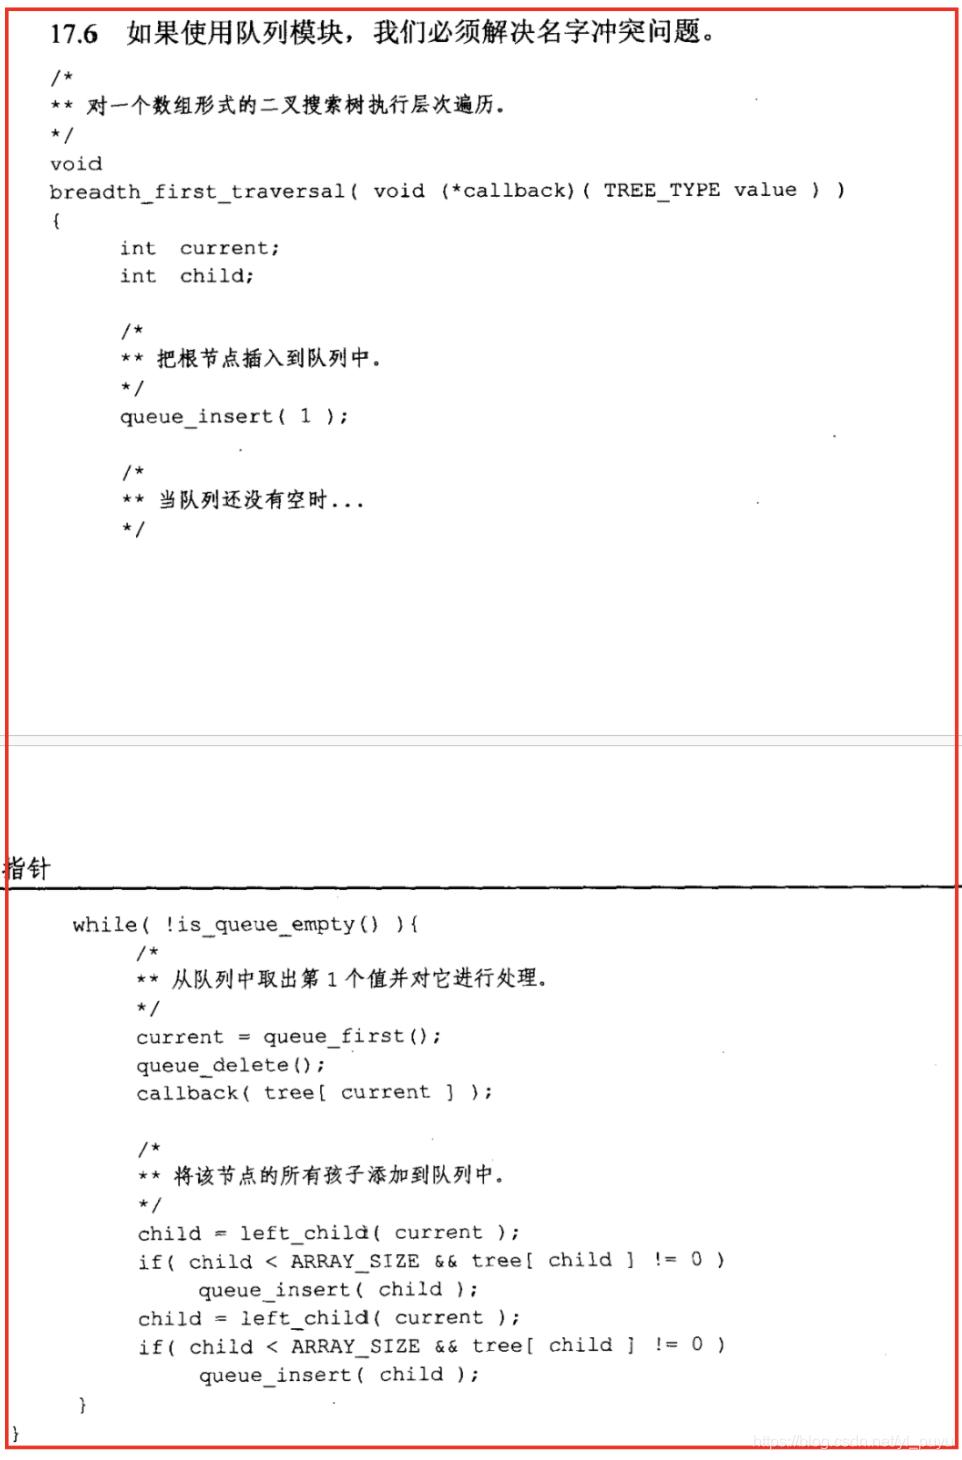 [外链图片转存失败,源站可能有防盗链机制,建议将图片保存下来直接上传(img-rLktzPo1-1610330697928)(https://raw.githubusercontent.com/Y-puyu/picture/main/images/20210110091933.png)]